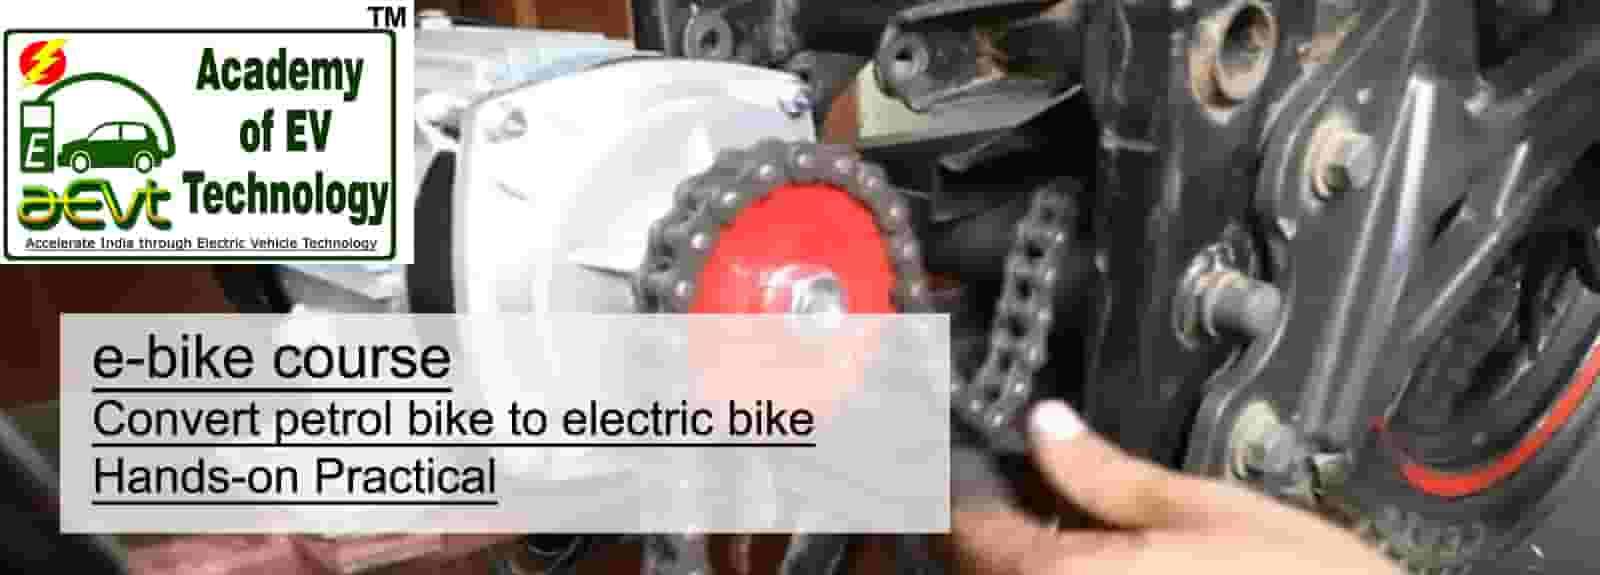 bike repairing course